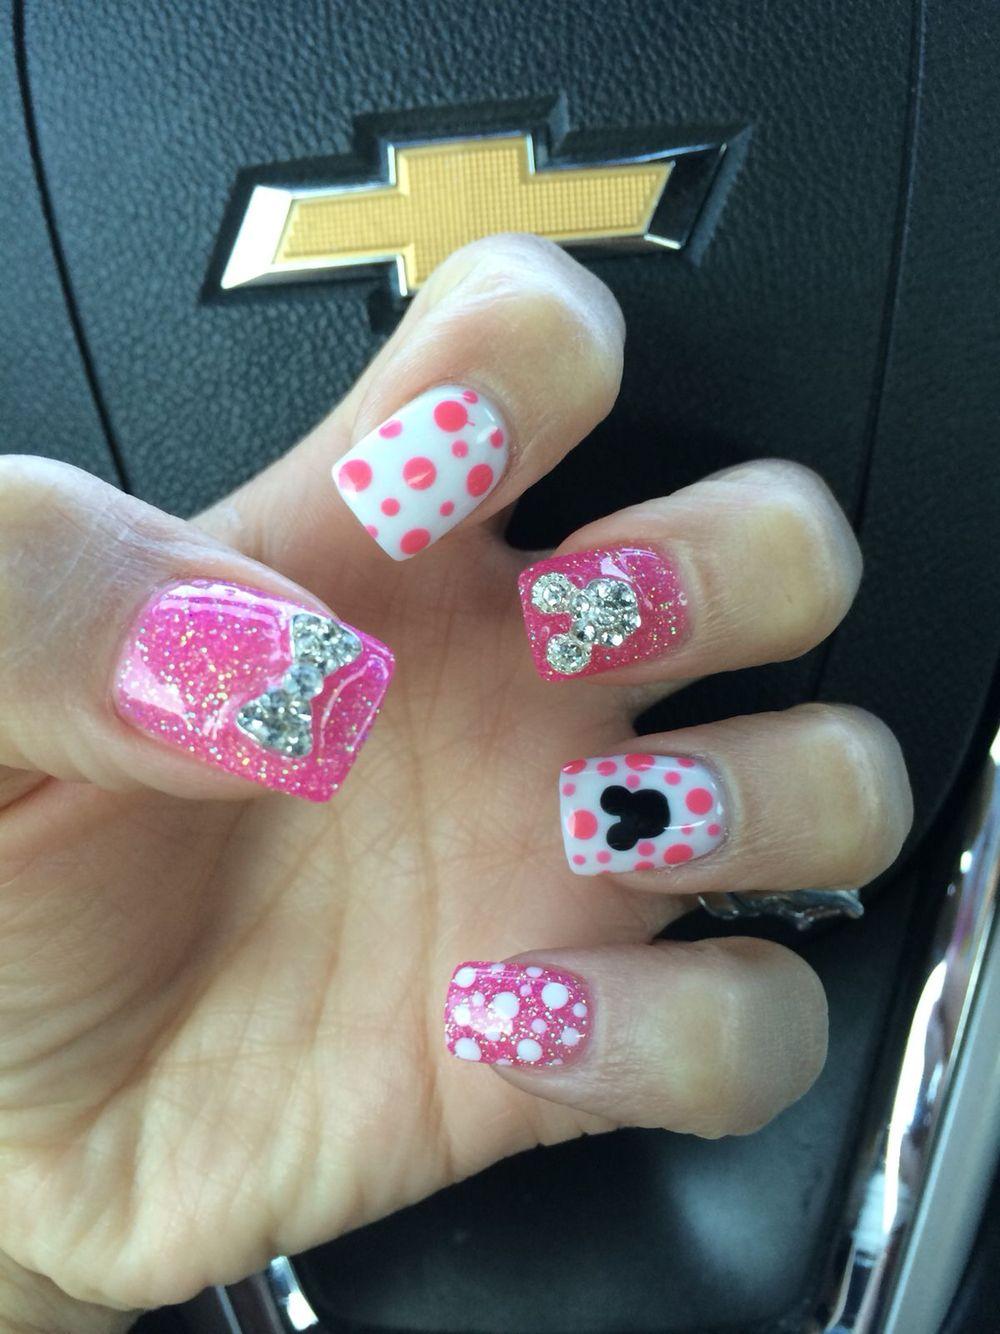 uñas con estilo | Nails-Disney | Pinterest | Disney nails, Disney ...